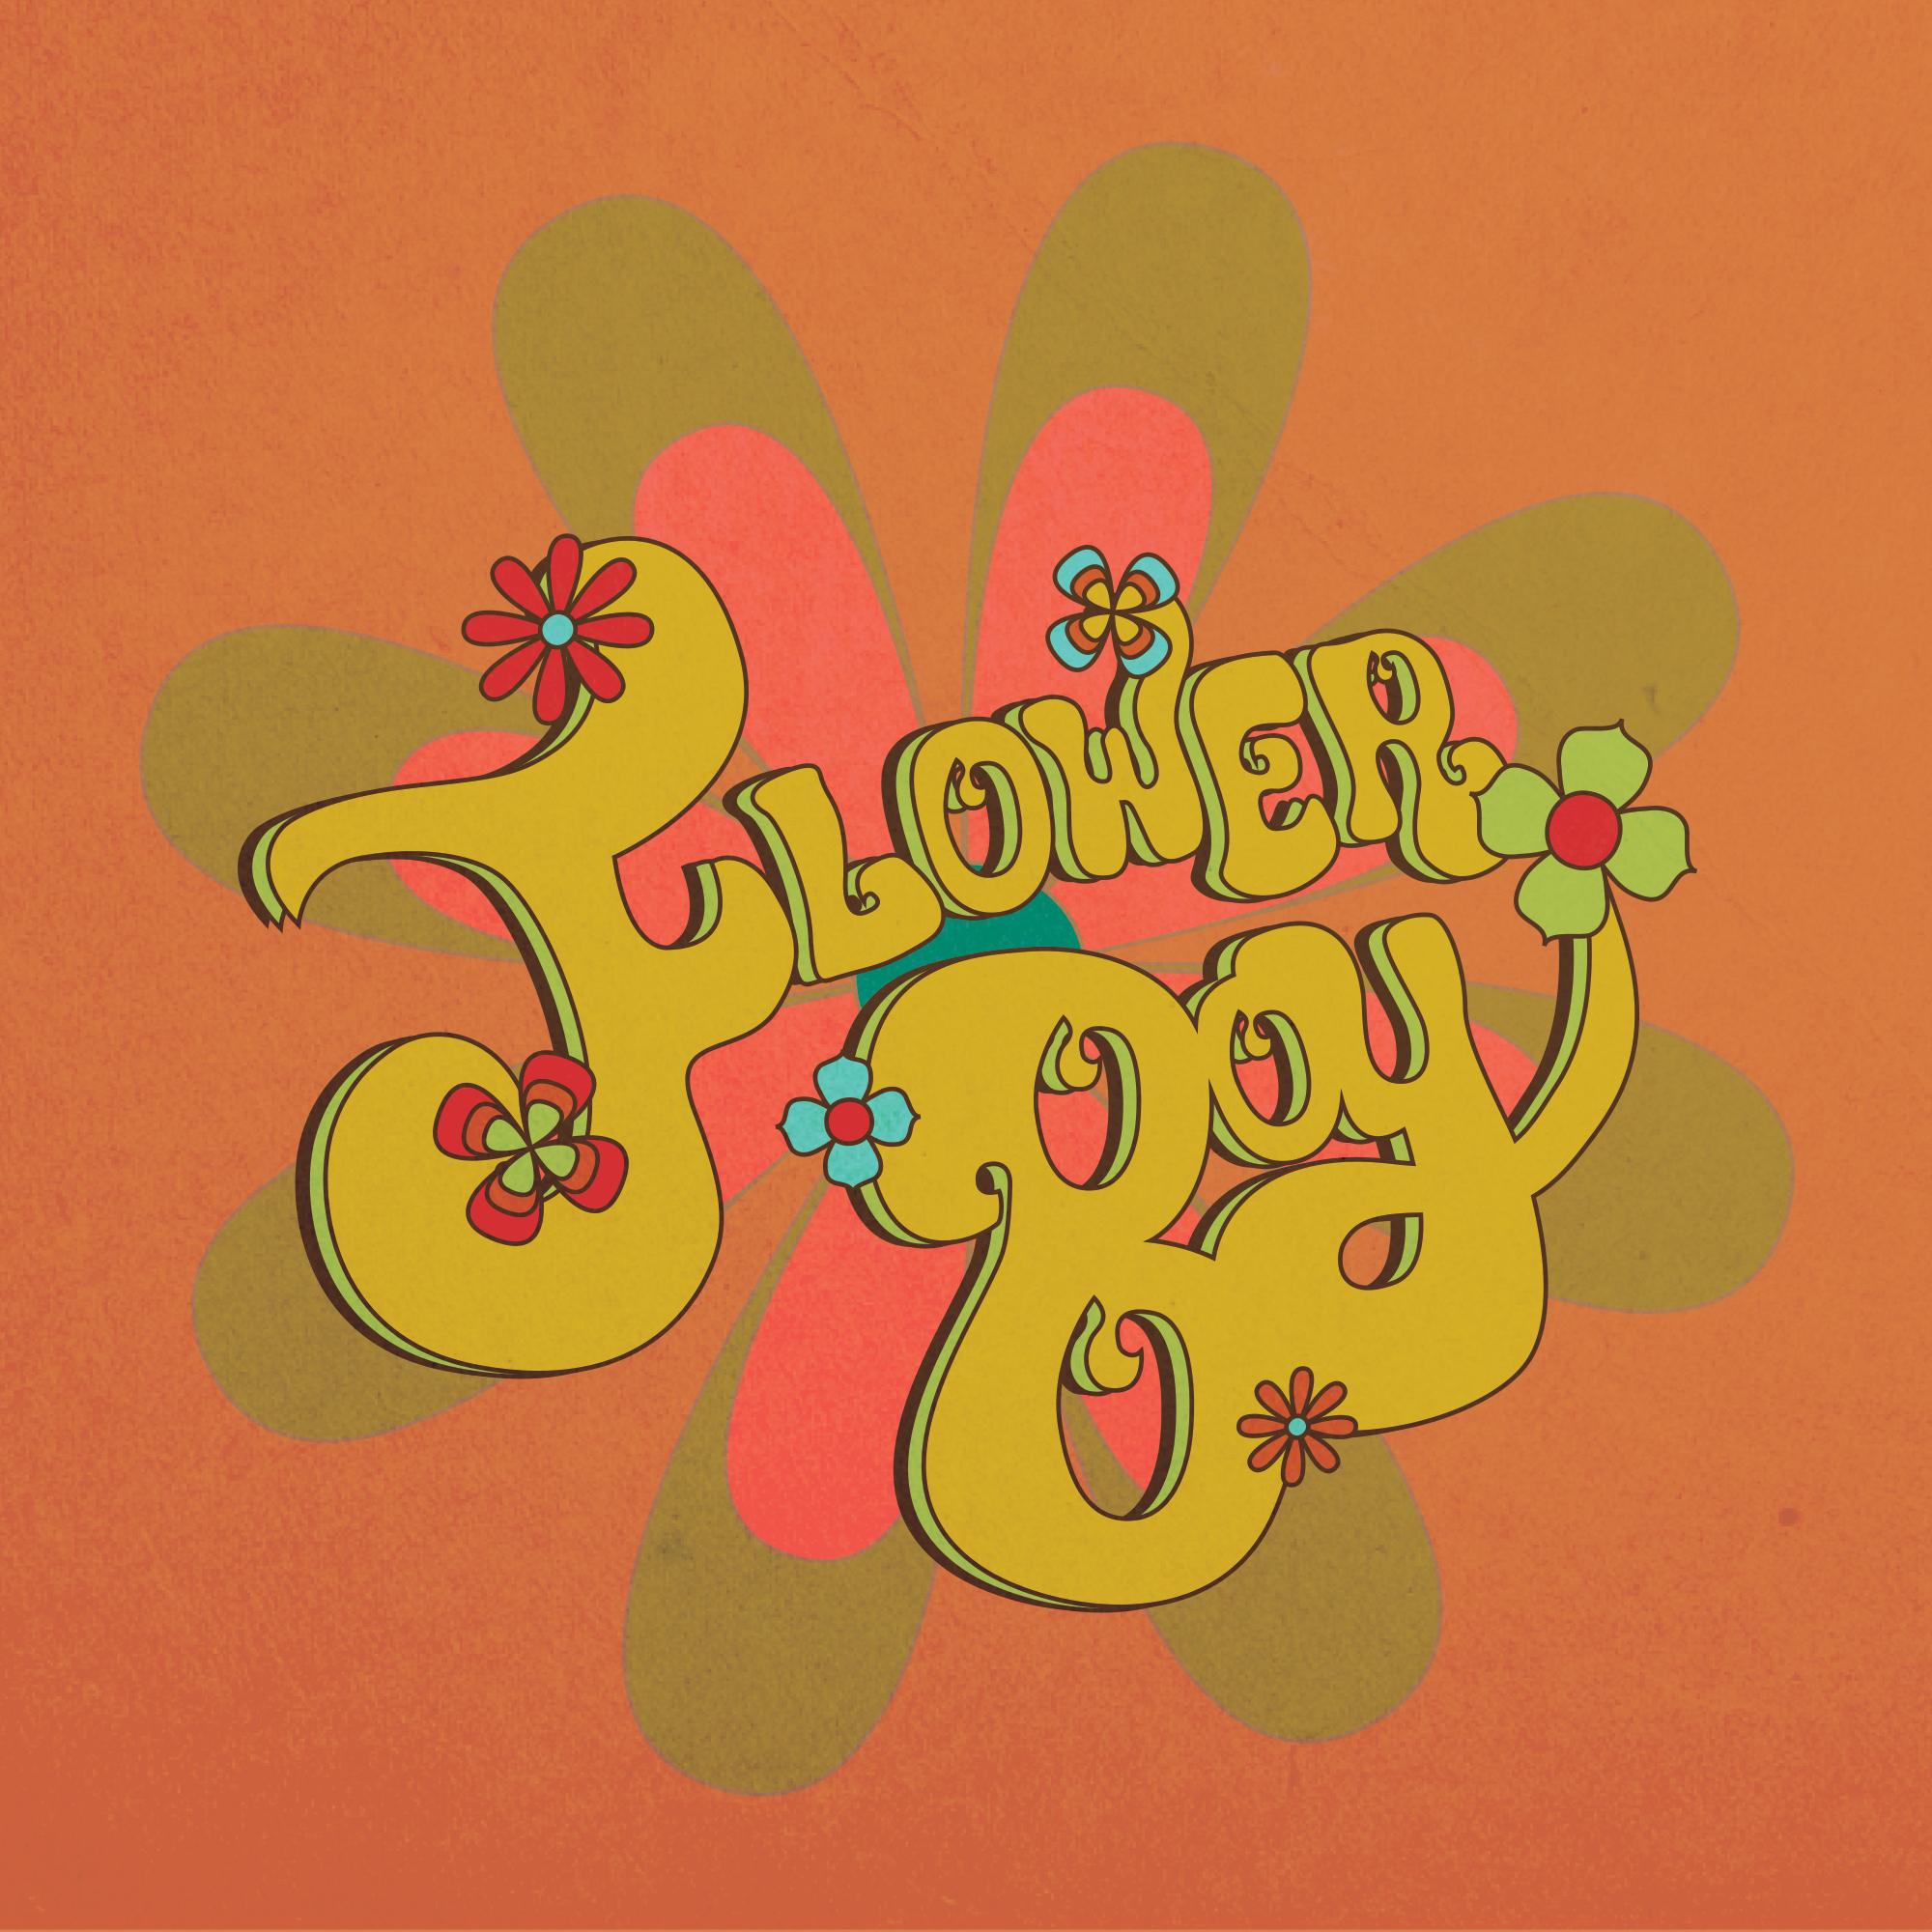 FlowerBoy.jpg